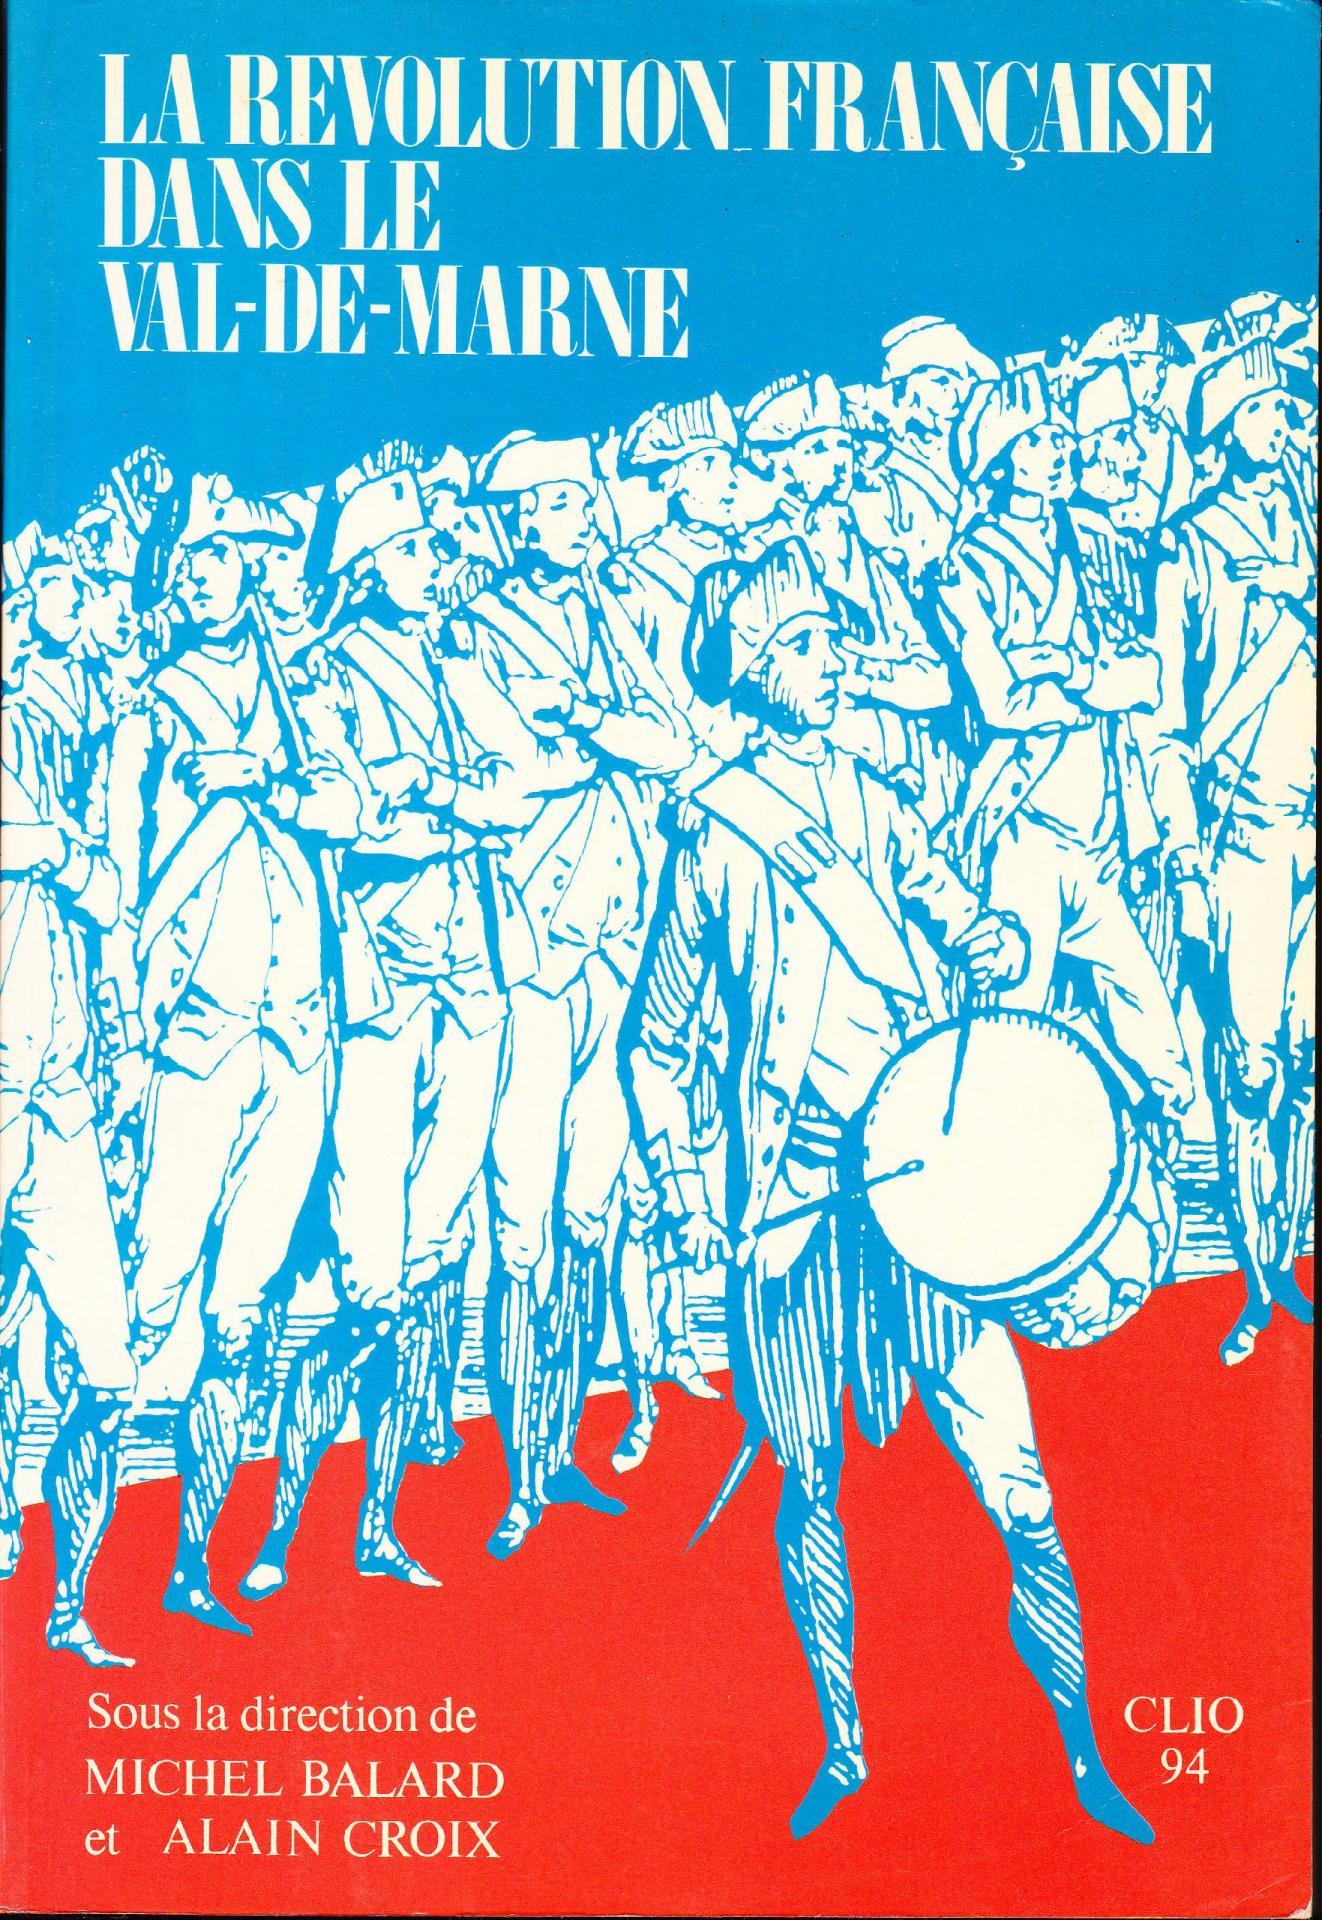 1989 balard croix livre revolution francaise vdm